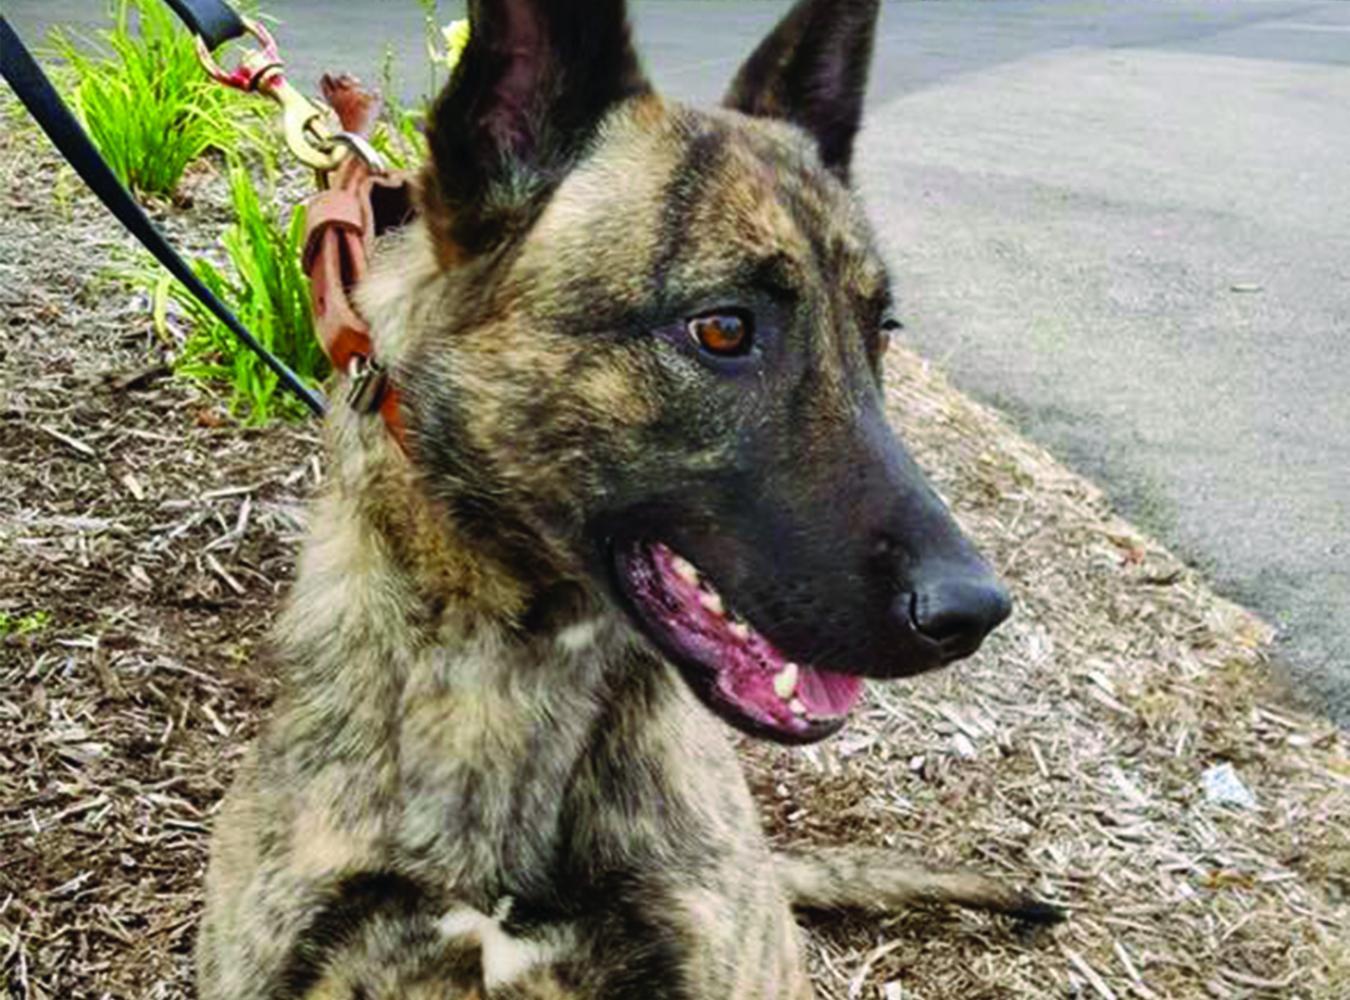 New police dog, Truus